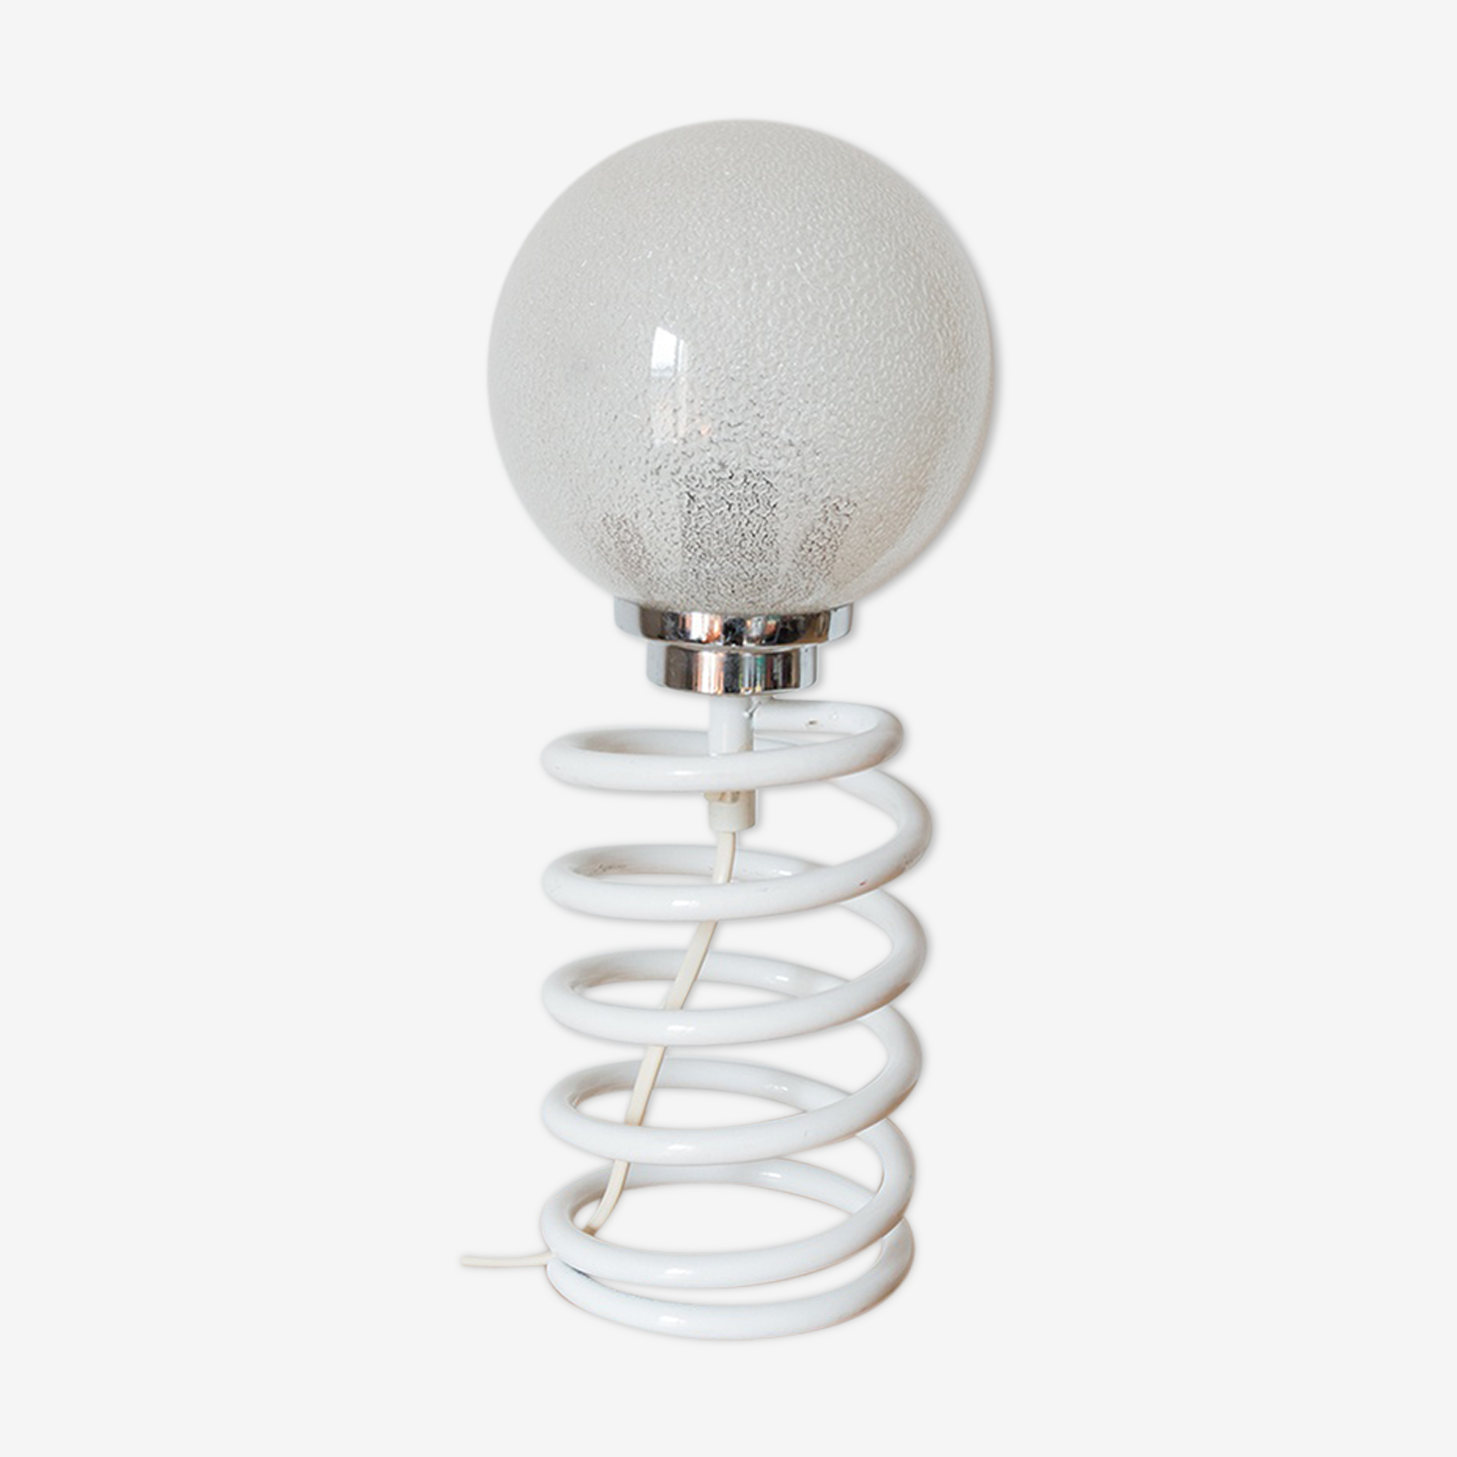 Lampe ressort 1970